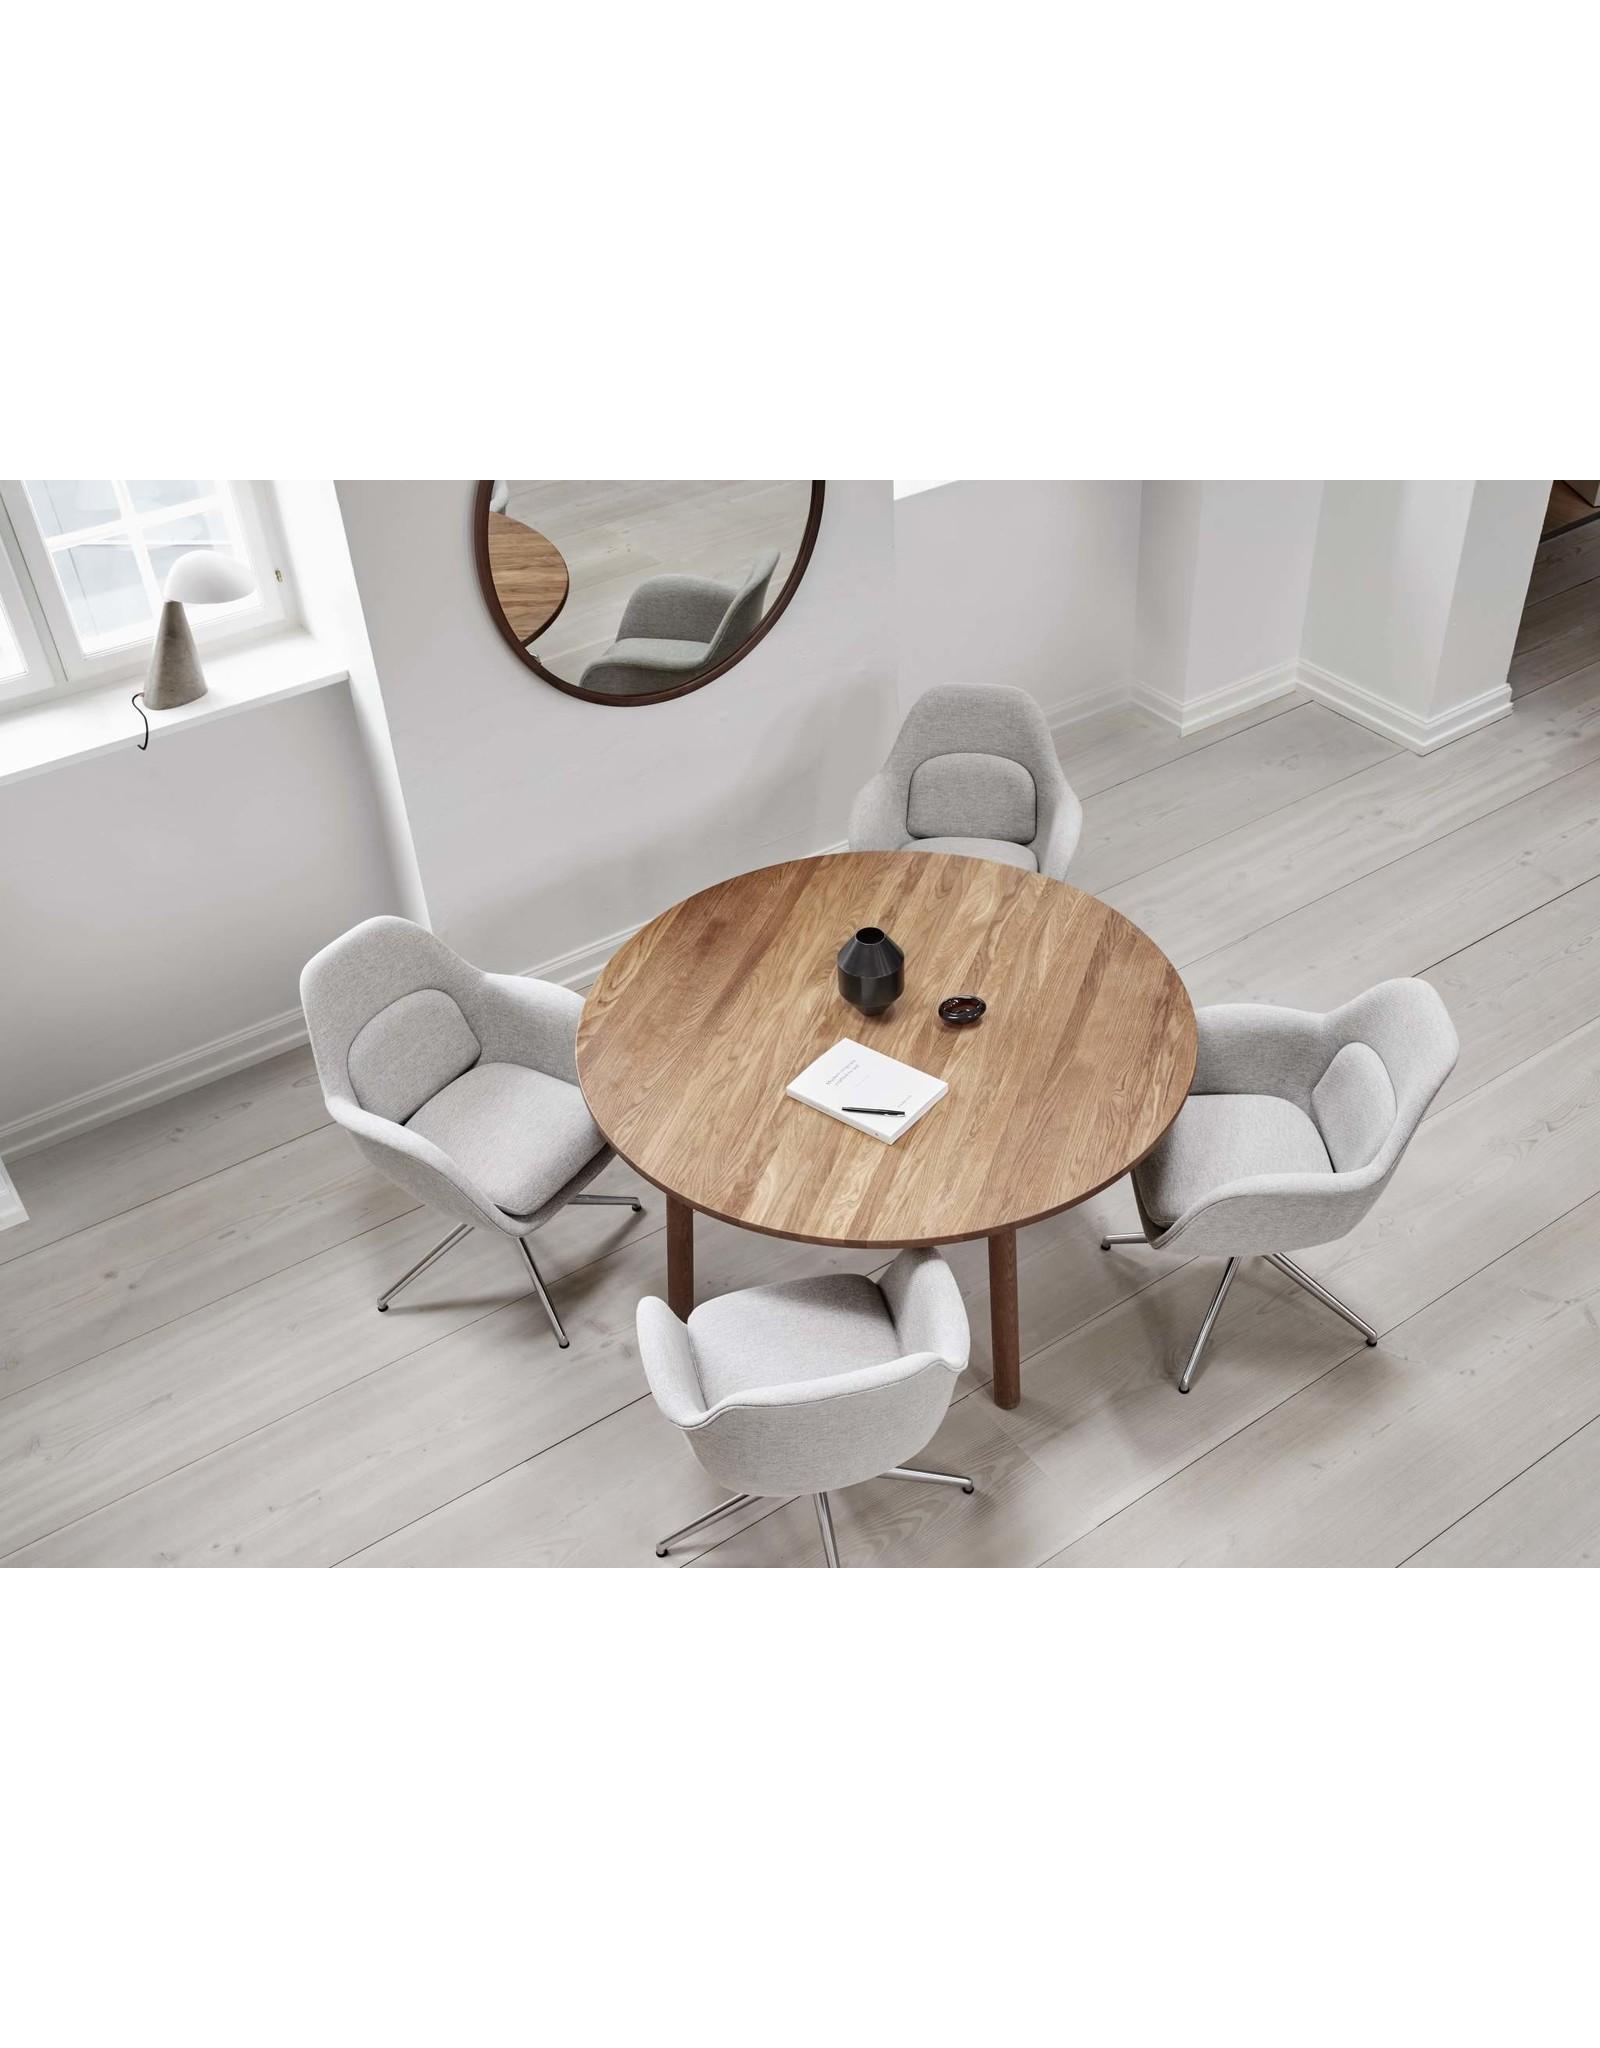 6121 TARO ROUND TABLE